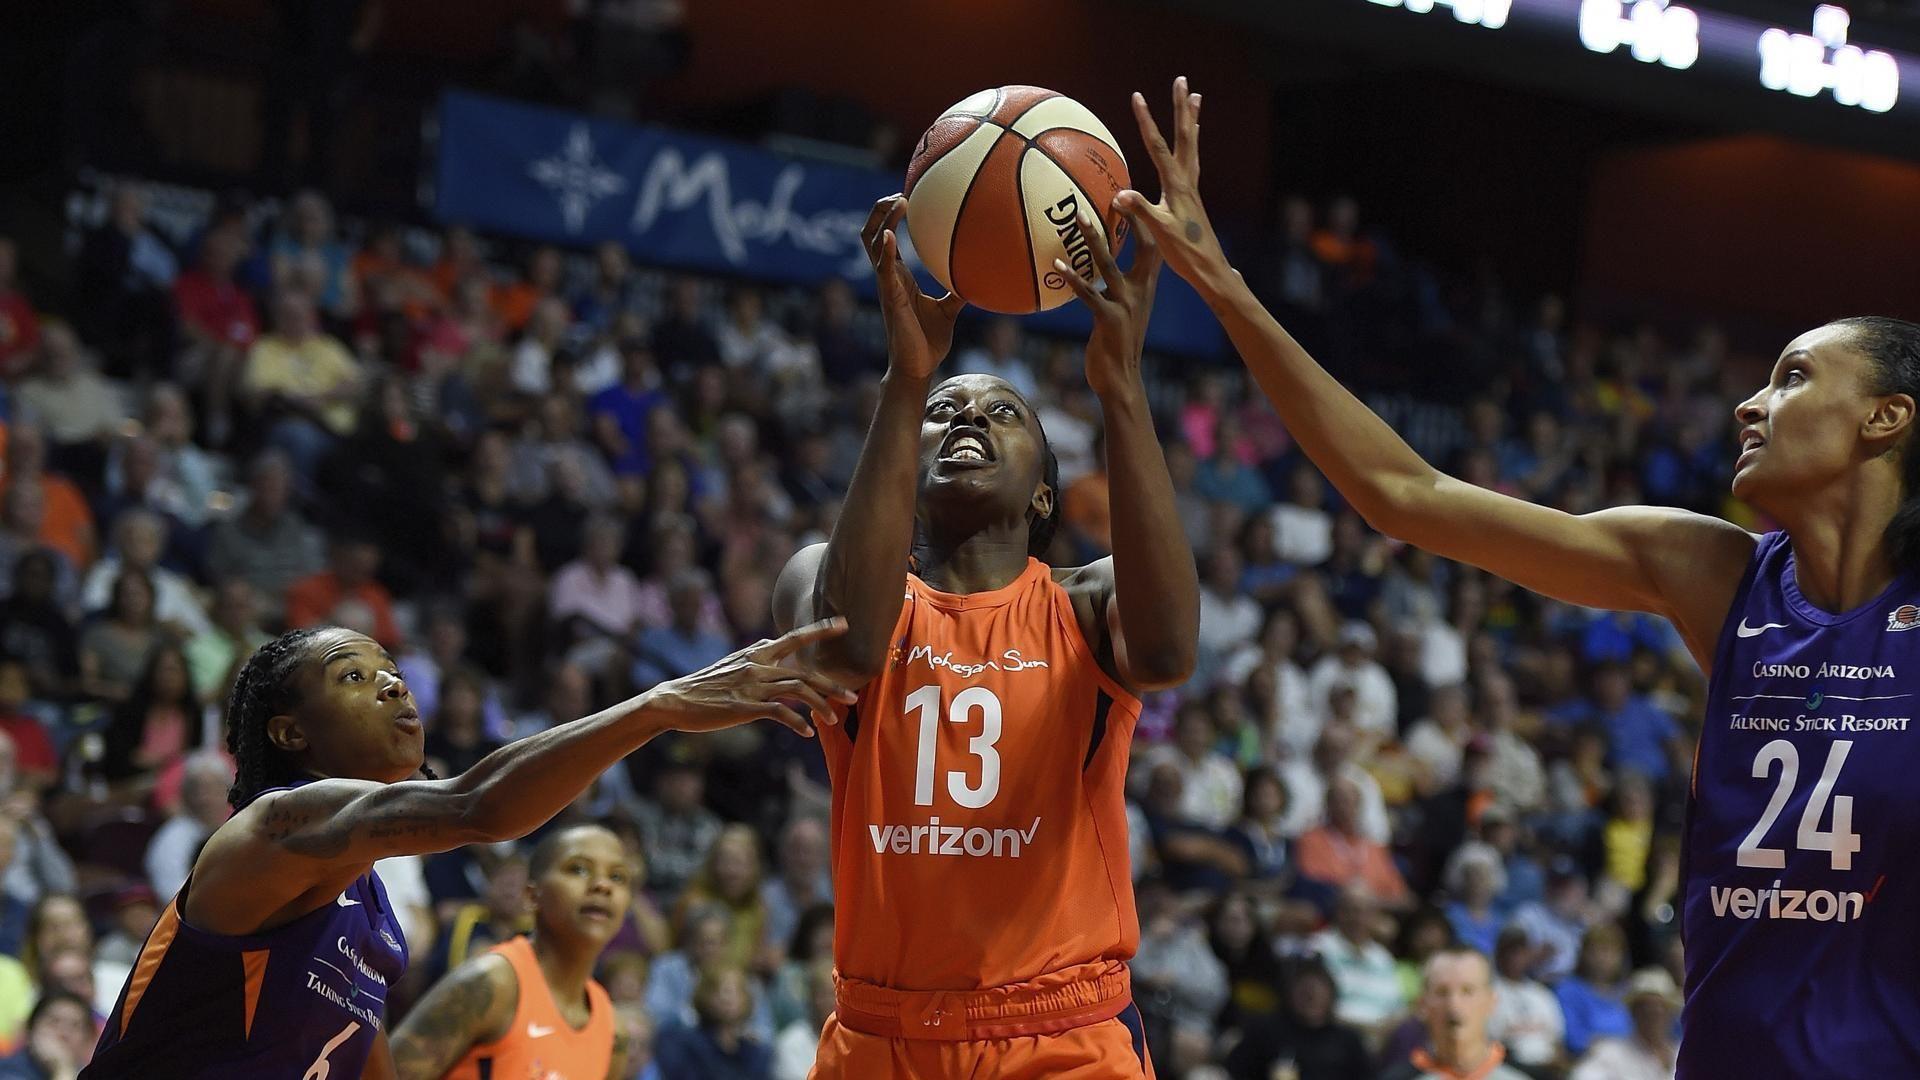 Pin by Women's Basketball Daily on WNBA 2018 Wnba